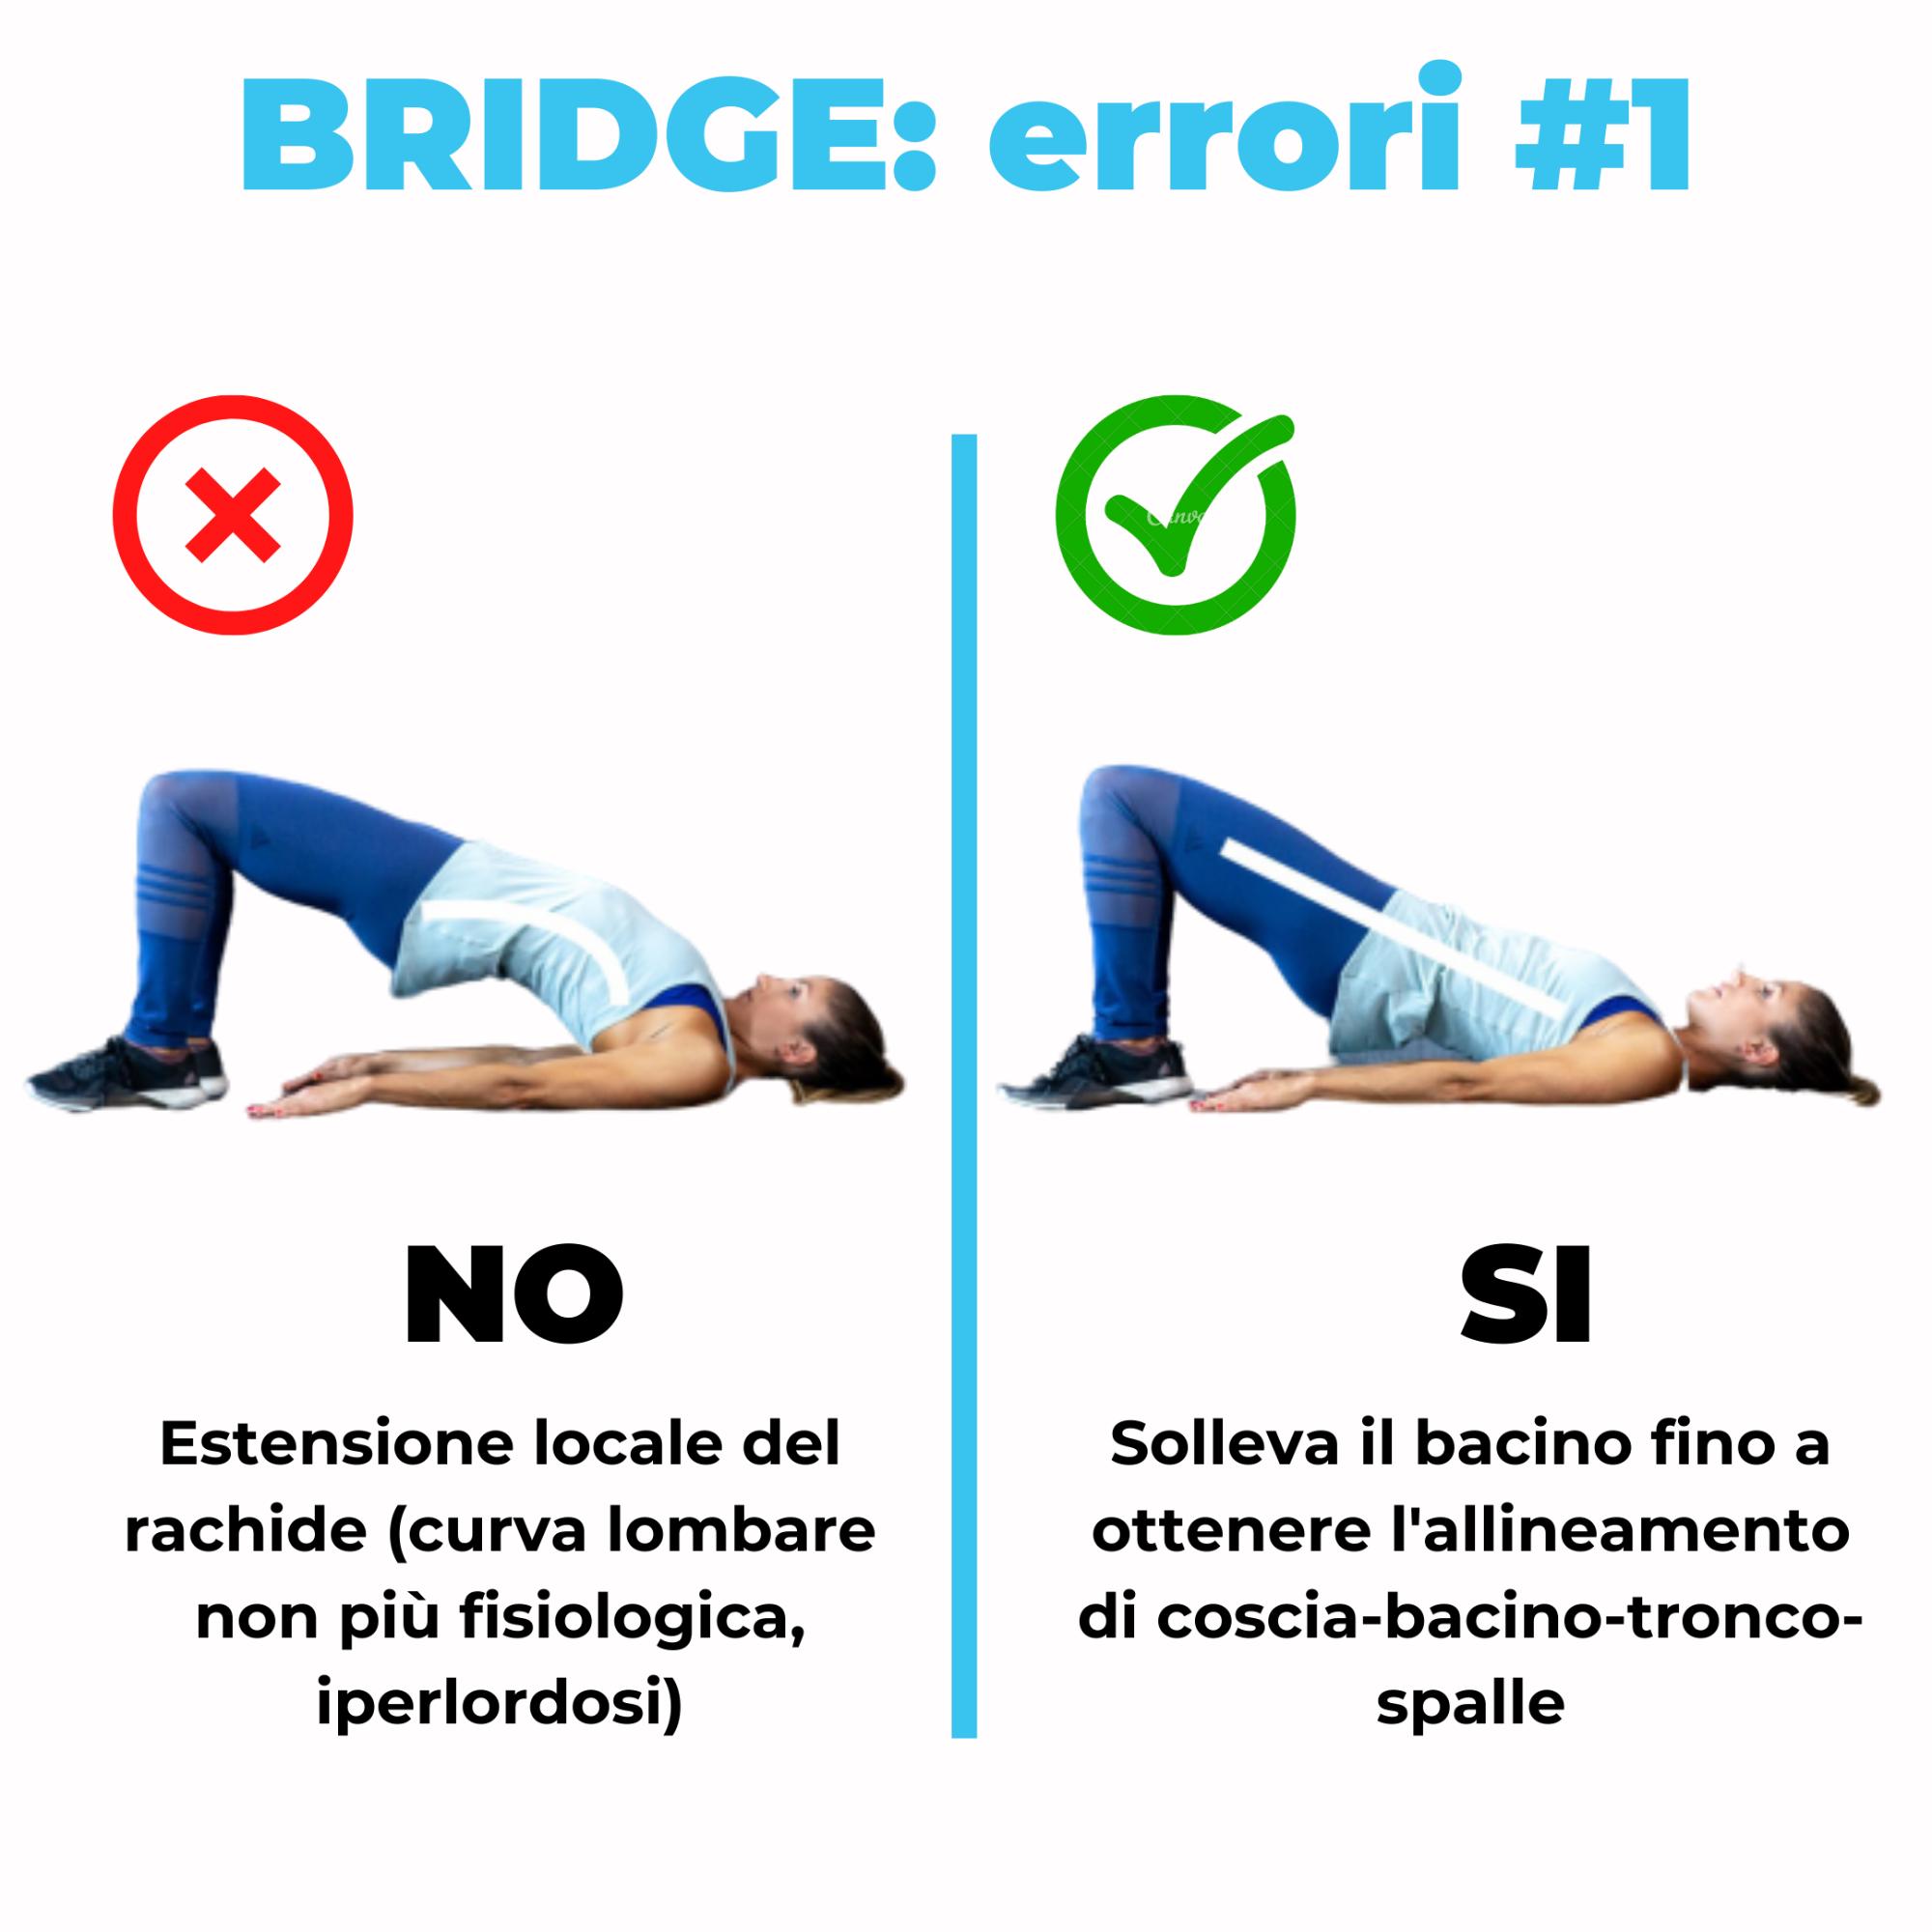 bridgeerrori1-1610787720.png